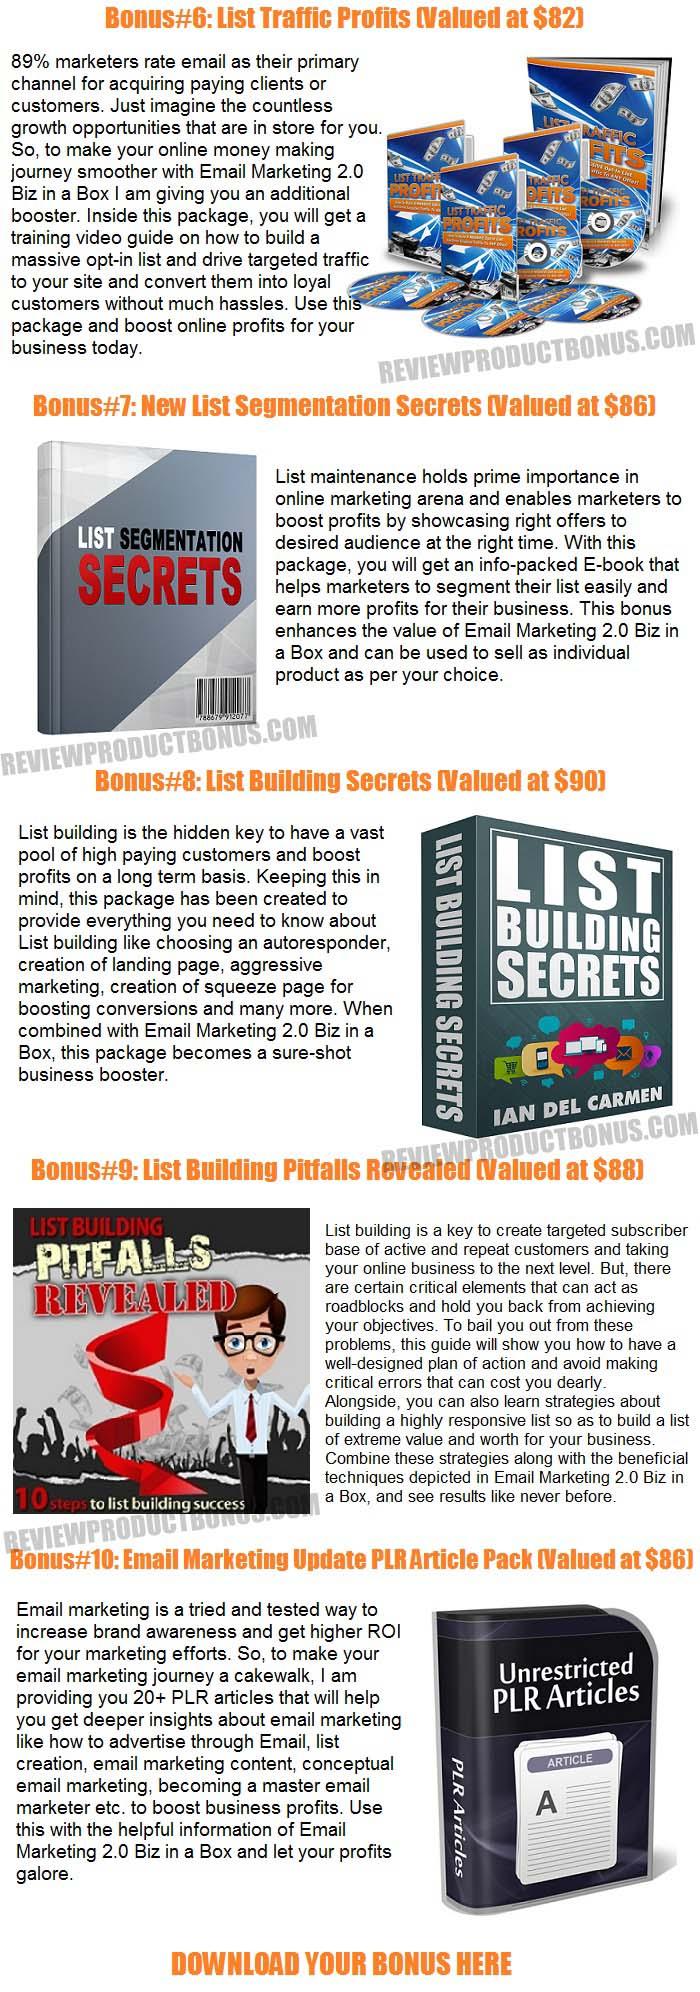 Email Marketing 2.0 Biz in a Box Bonuses